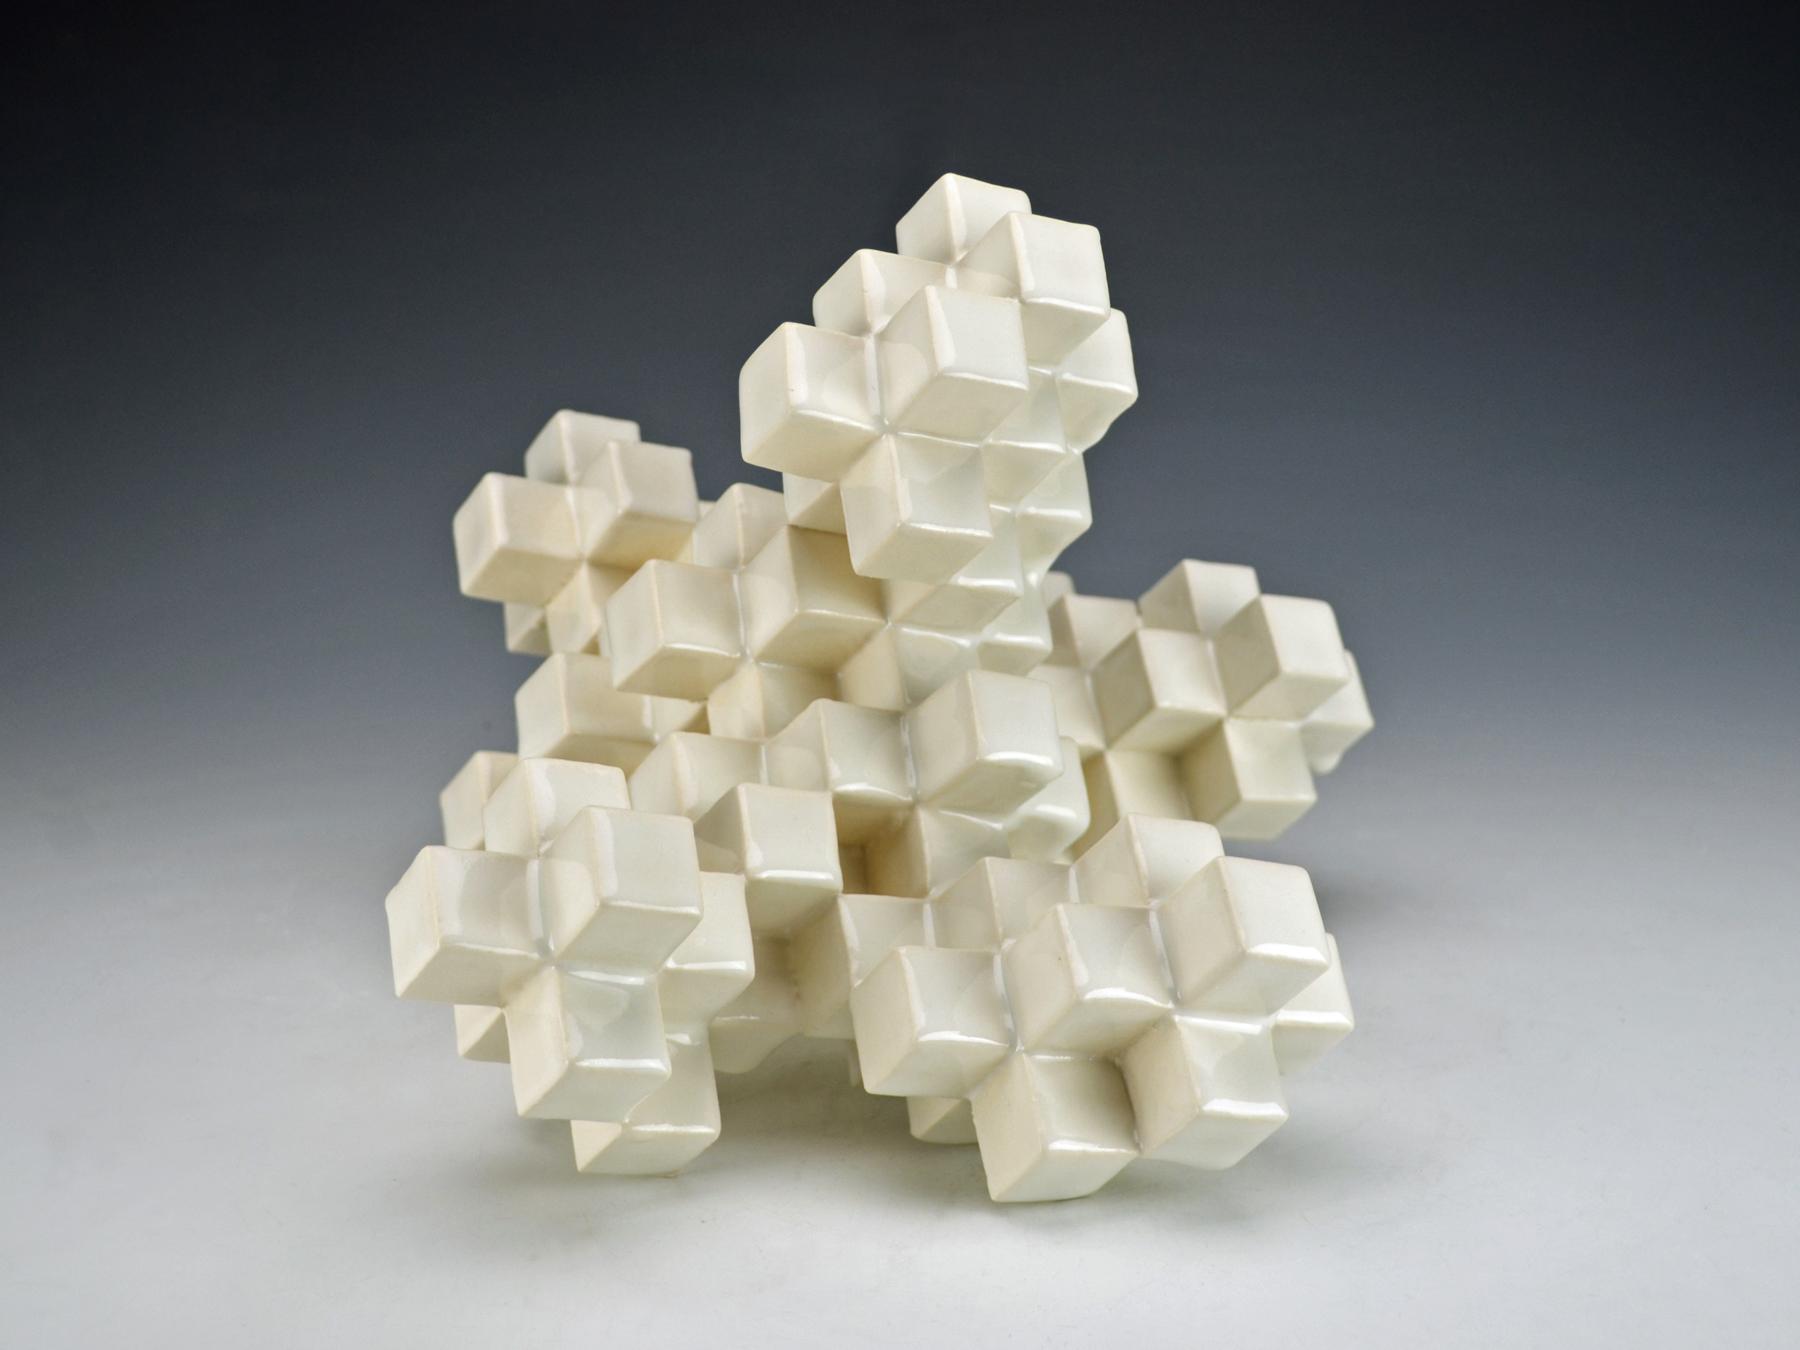 Cubic Series: Construction V  |  12 x 9 x 12 inches  |  Porcelain, Glaze  |  2017